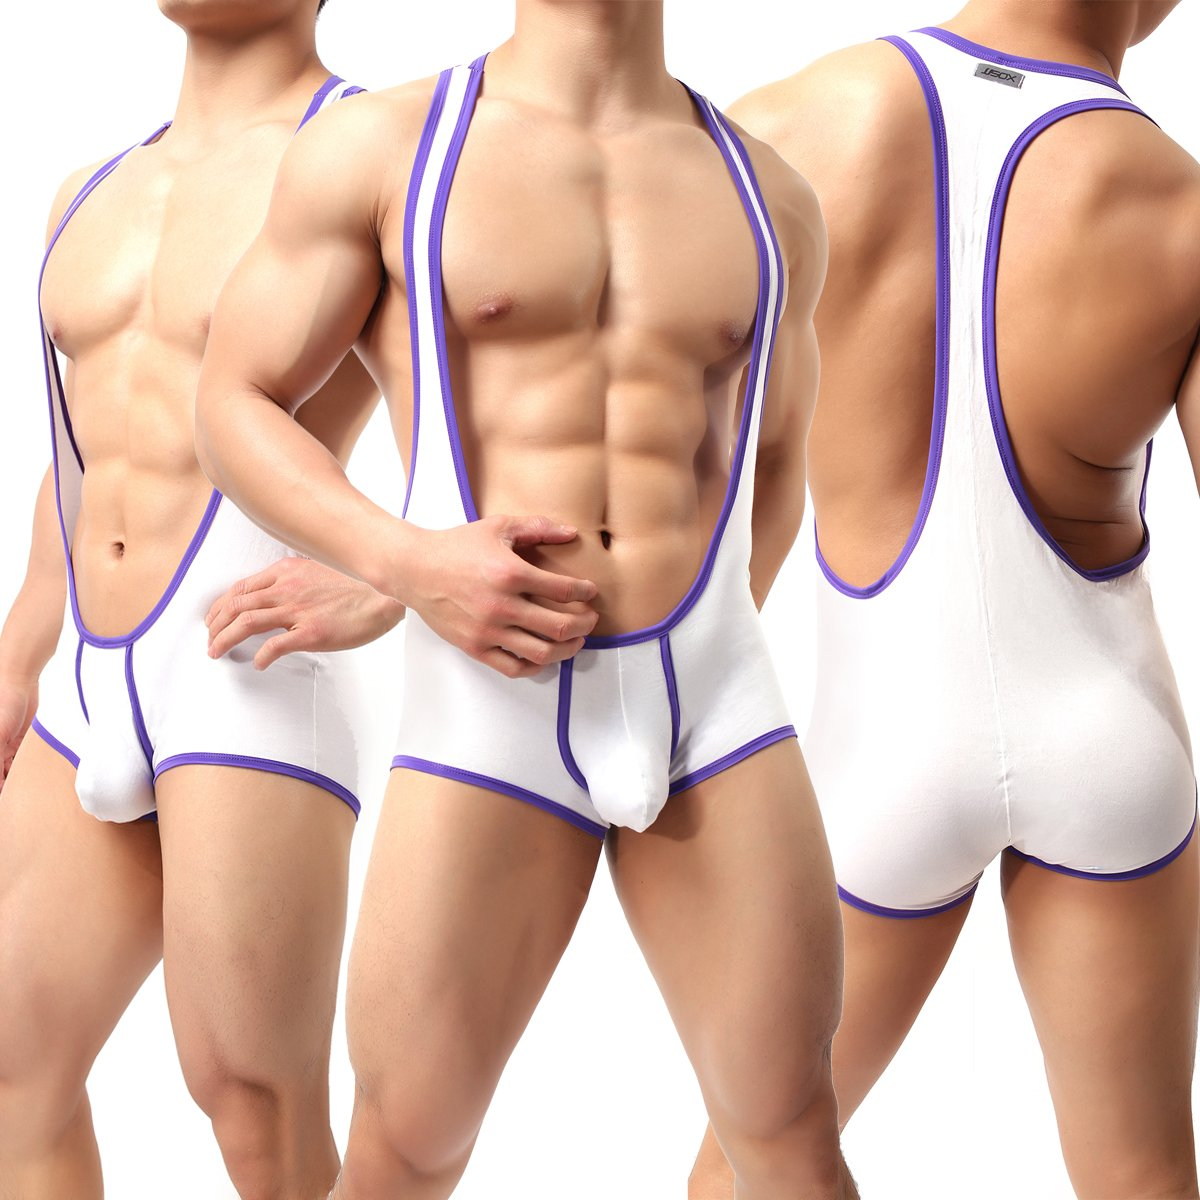 Yeke Men's Sexy Body Leotard Freestyle Wrestling Singlet Backless Modal Bodysuit (White, XL)